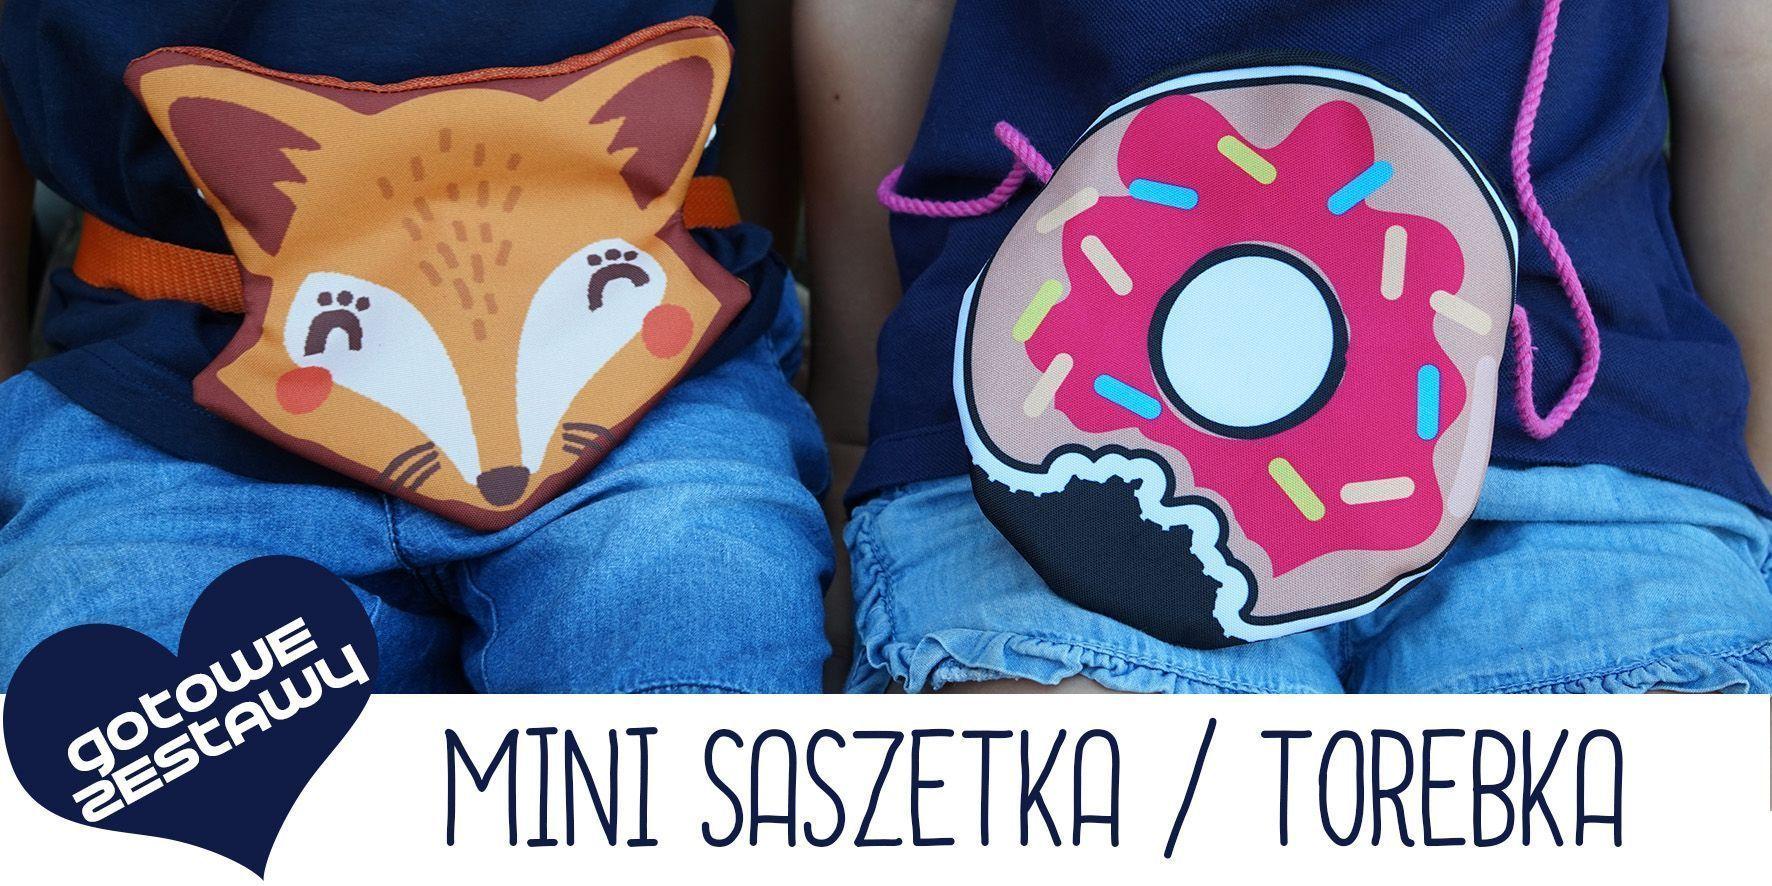 Mini saszetka / torebka